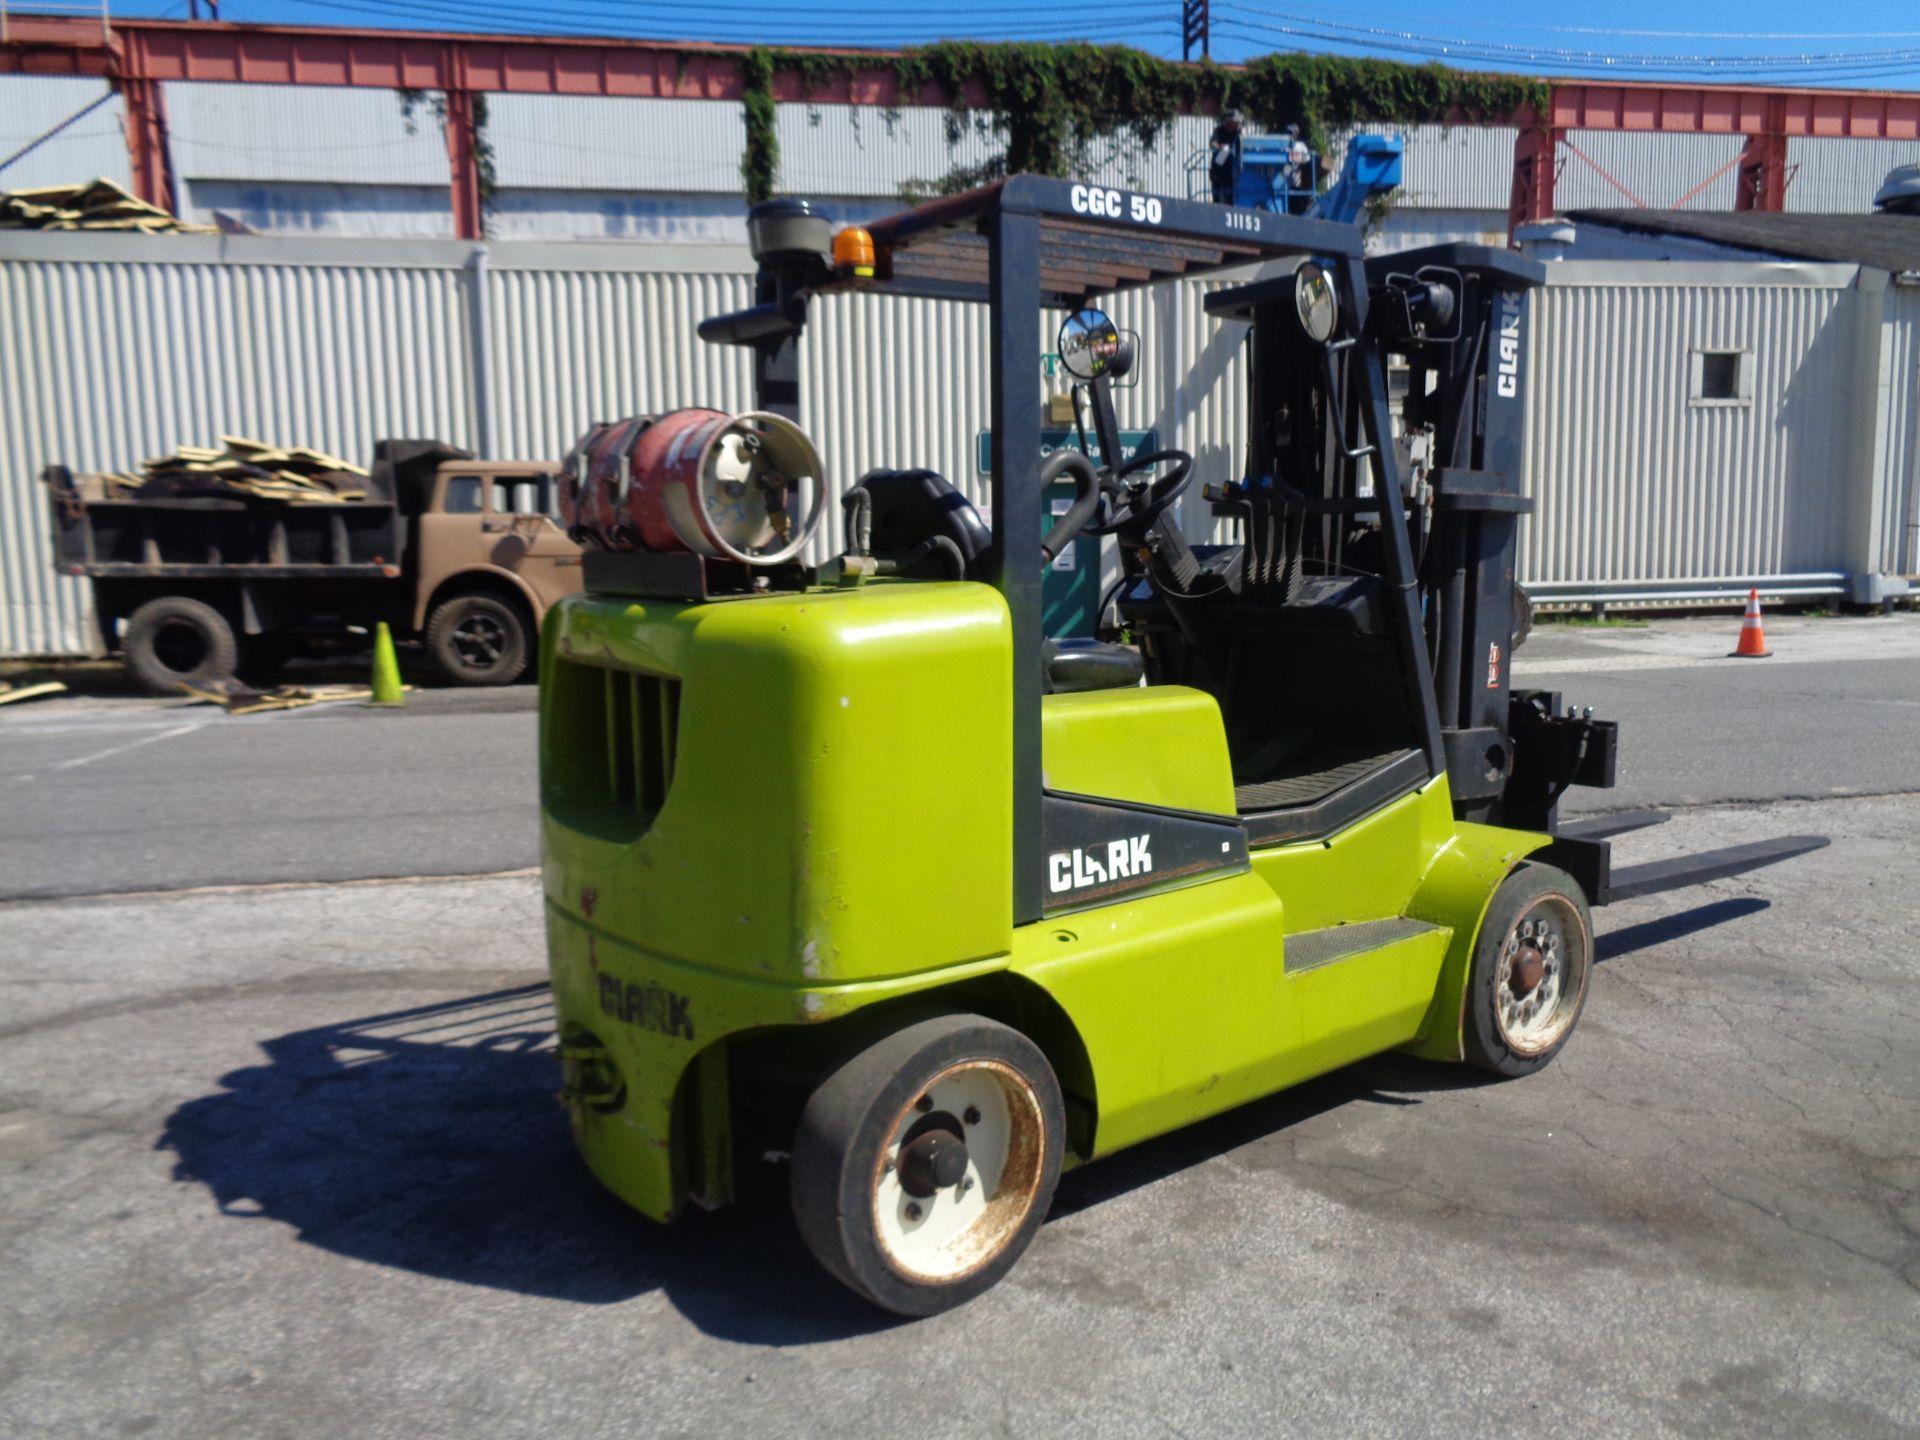 2014 Clark CGC500 10,000 lb Forklift - Image 8 of 12